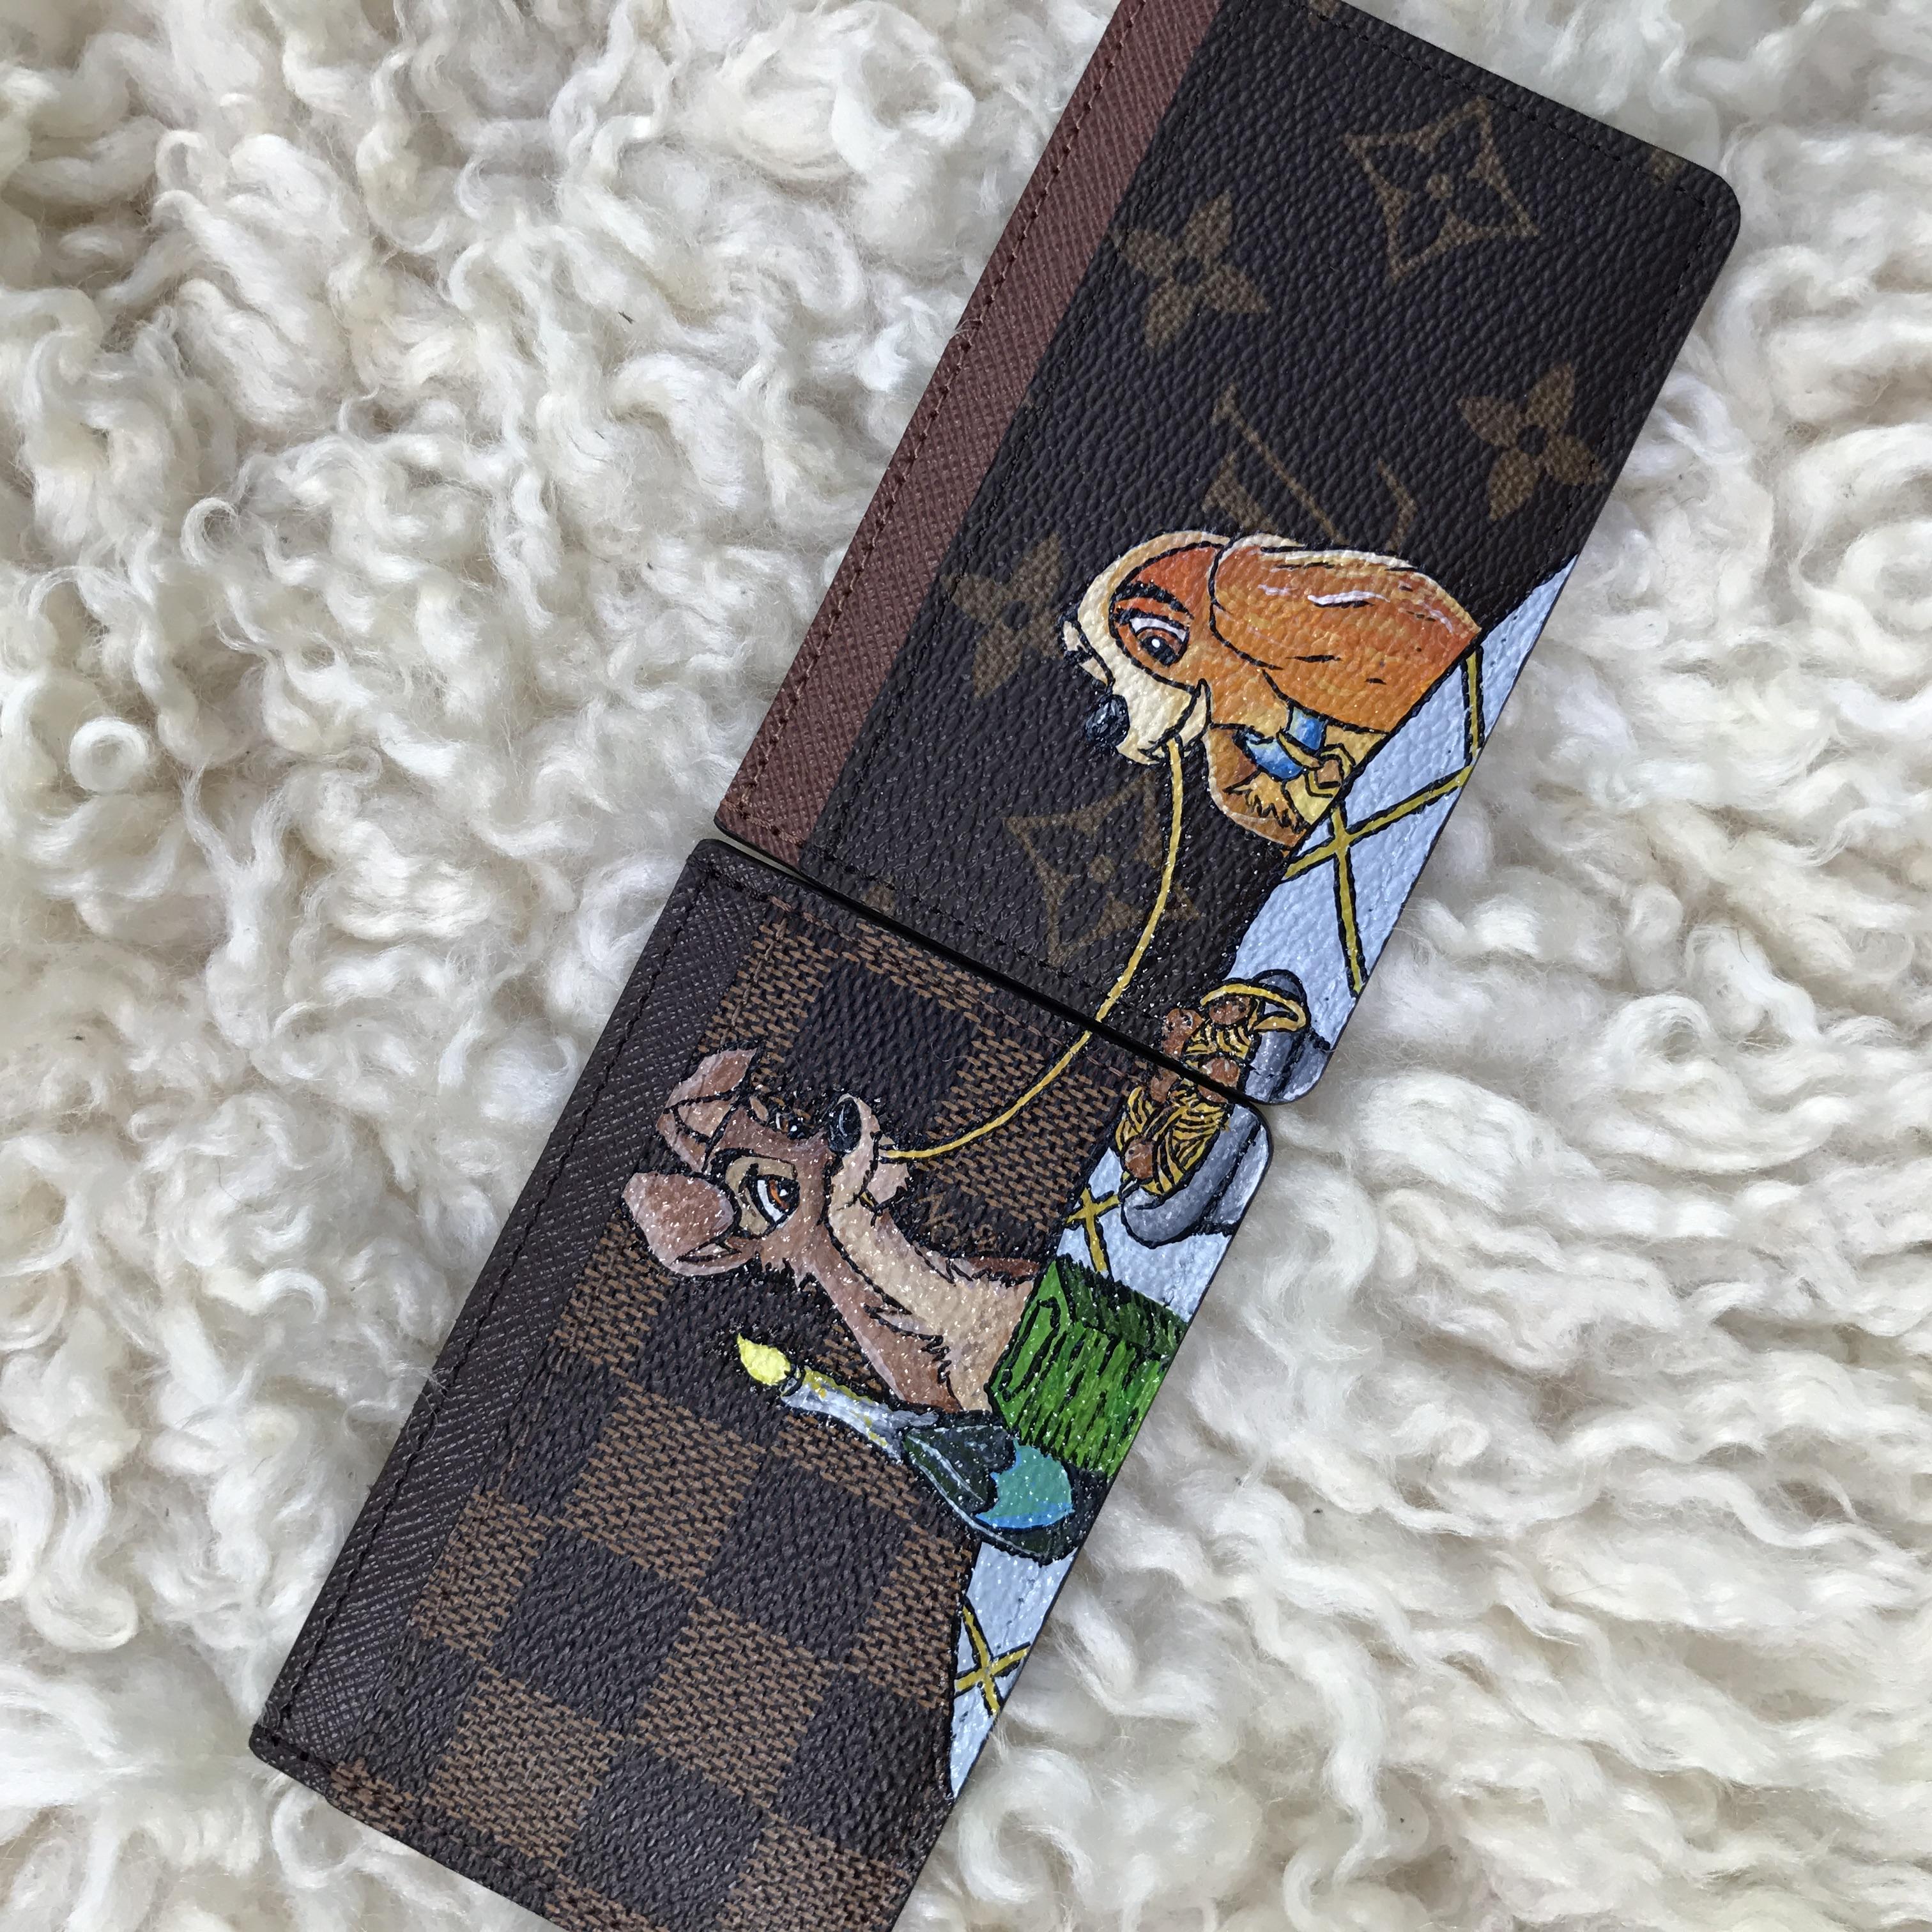 Louis Vuitton Card Holders